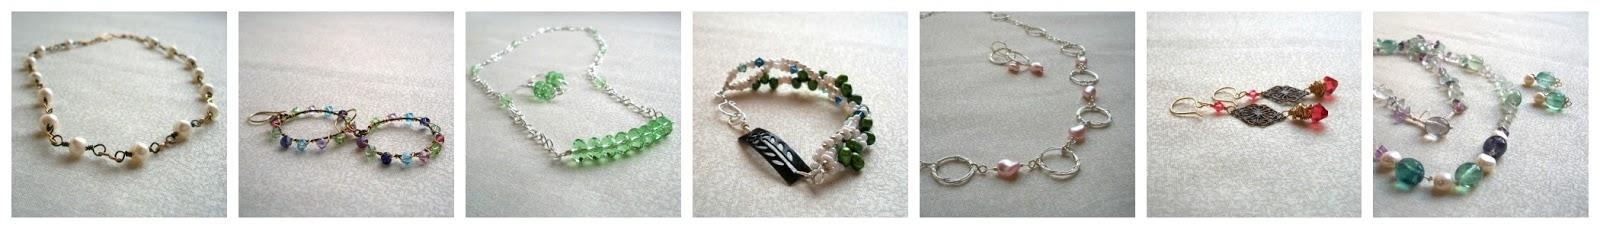 Meadowland Designs Handmade Feminine Jewelry Desgins